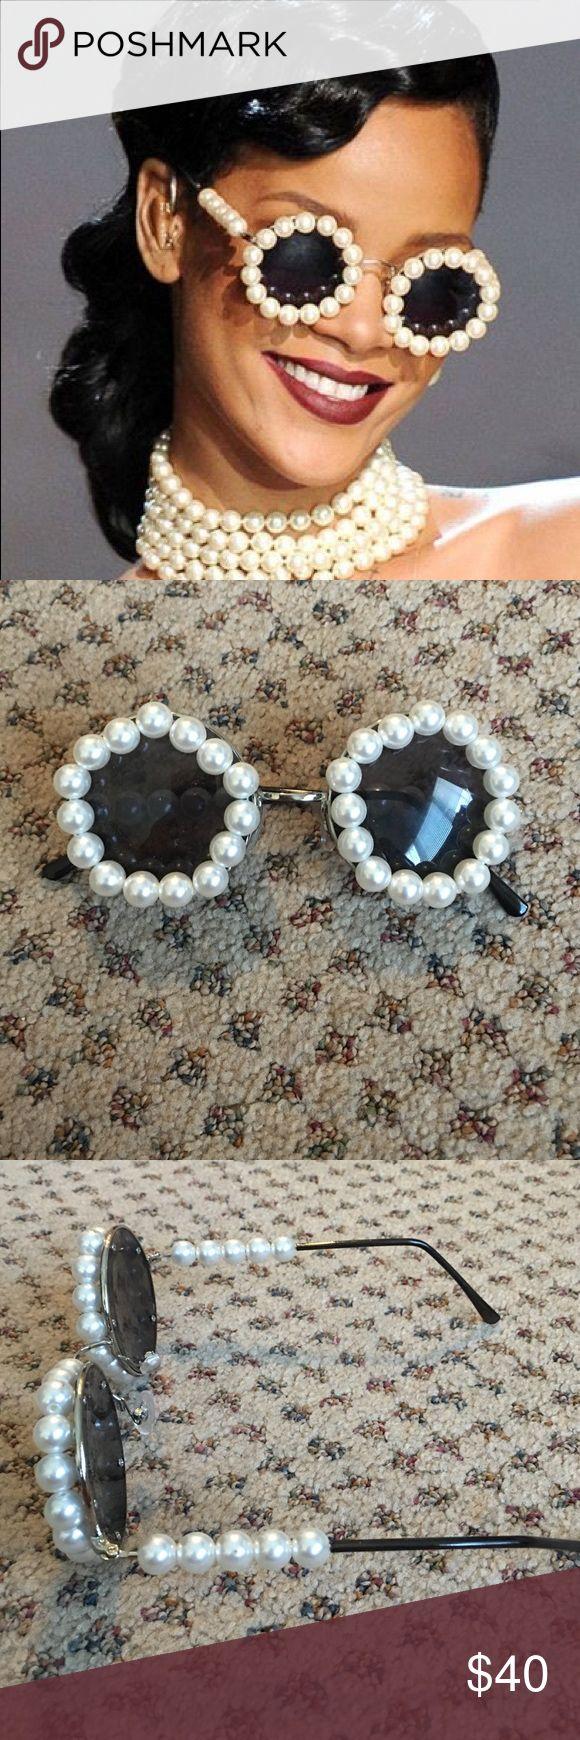 Pearl Sunglasses similar to the ones Rhianna wore. Super cute!!! Accessories Sunglasses